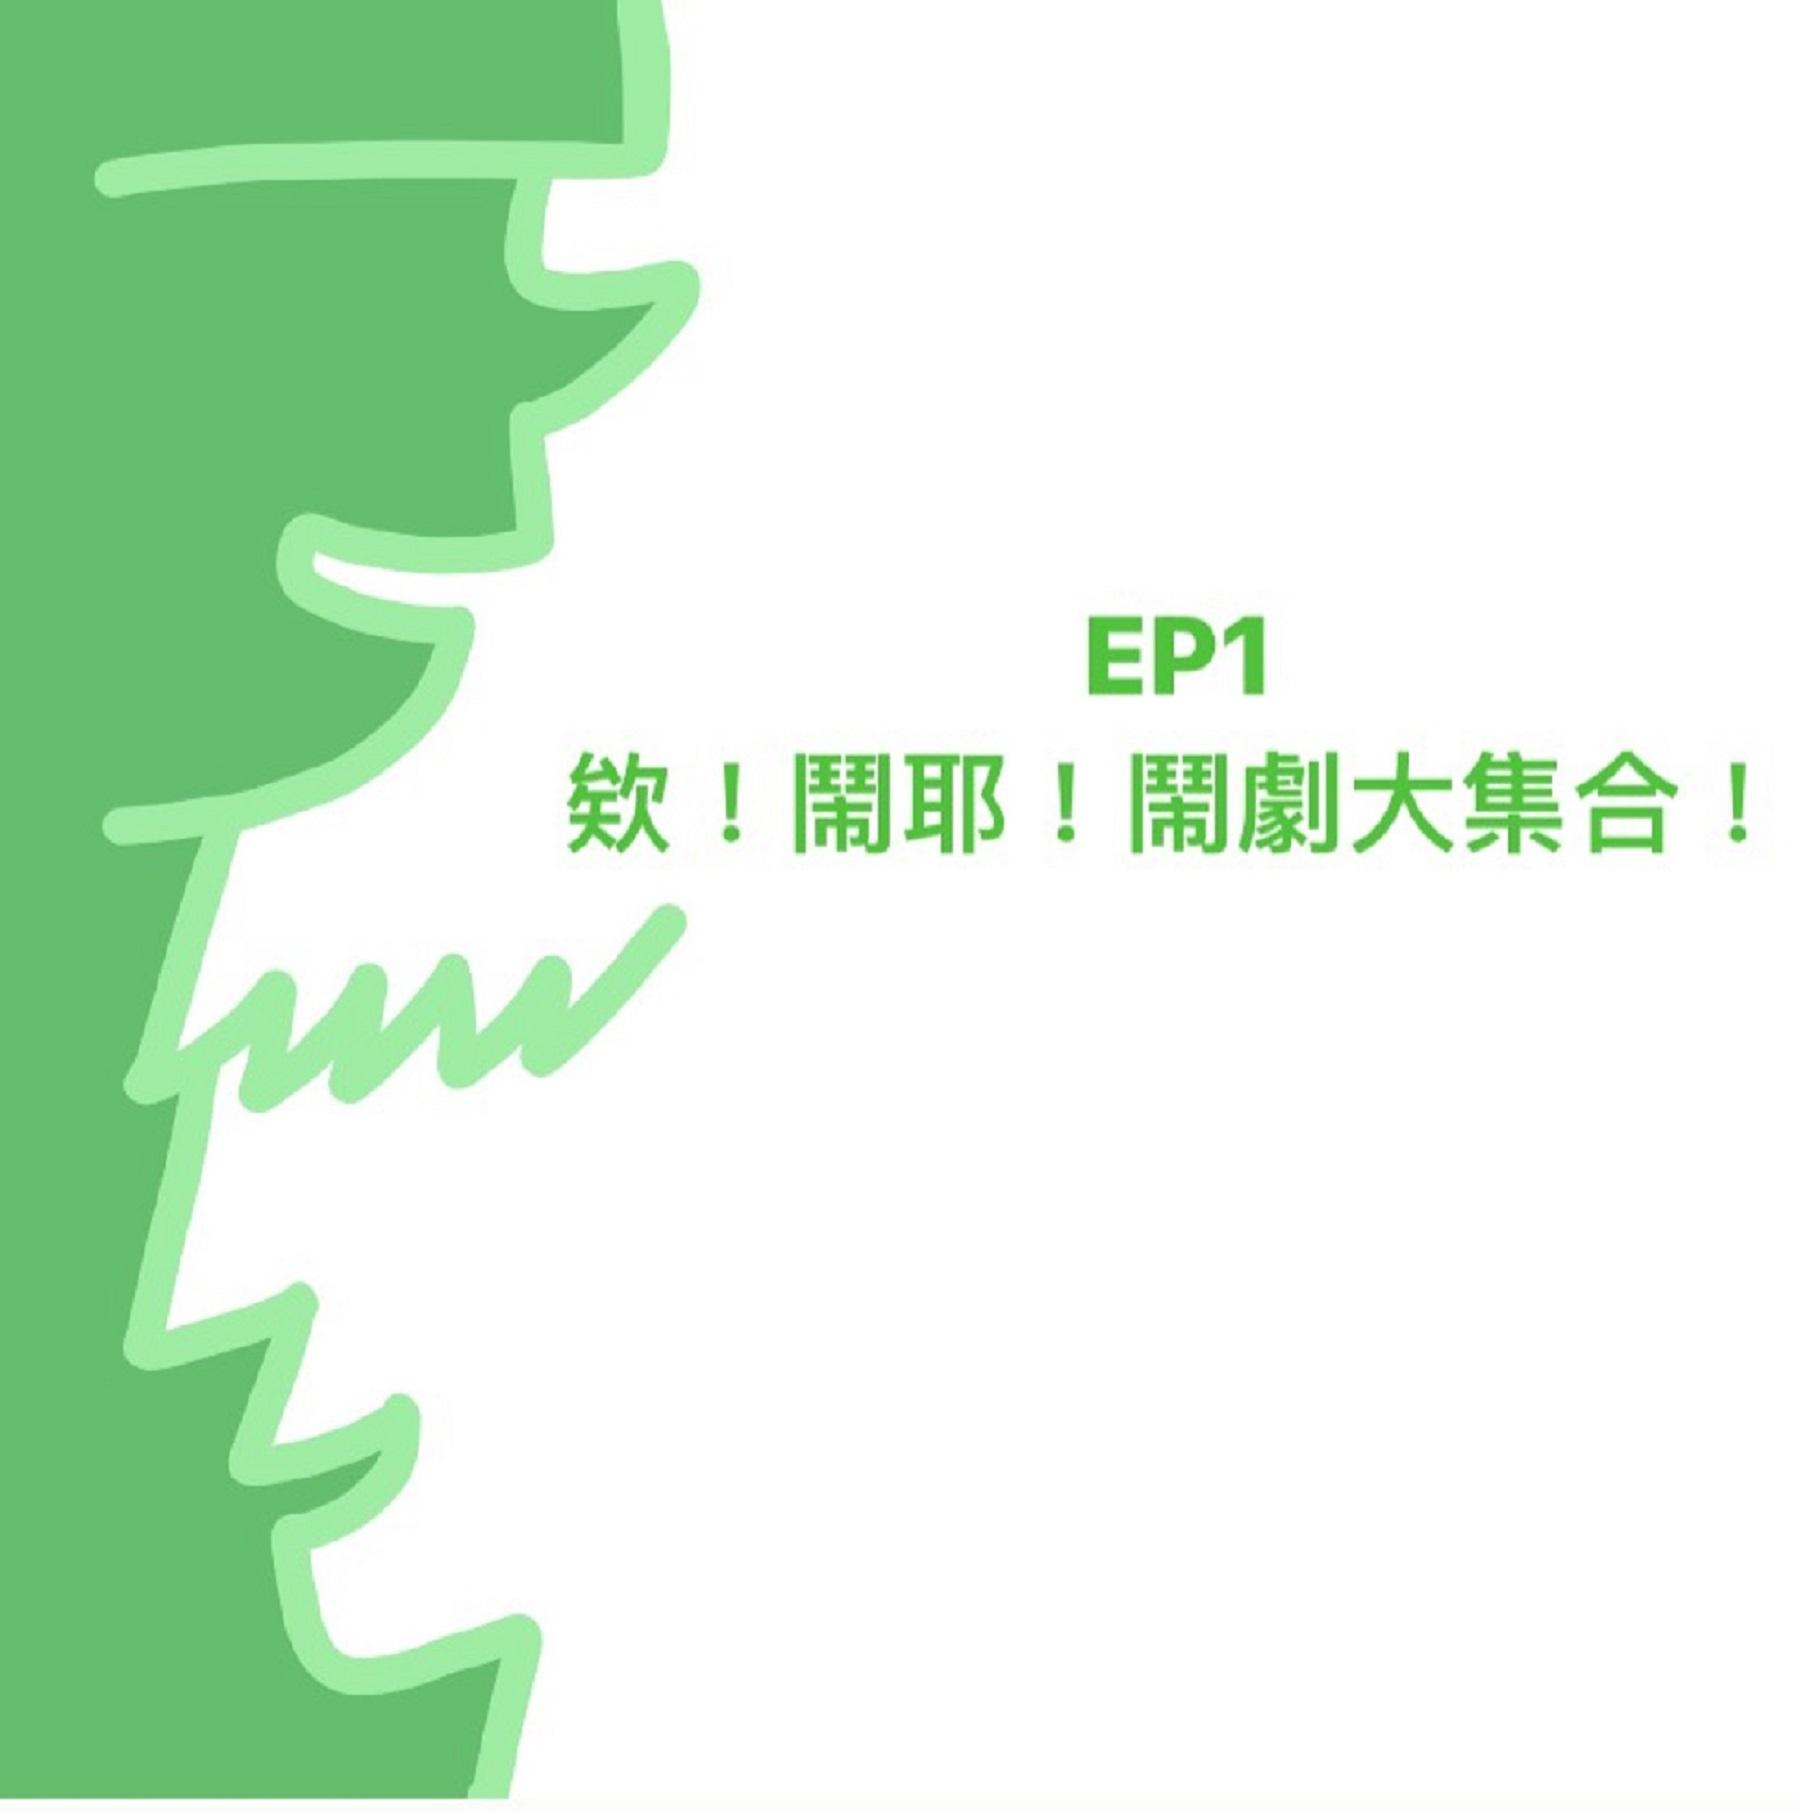 S1 EP1 / 欸!鬧耶! 鬧劇大集合!